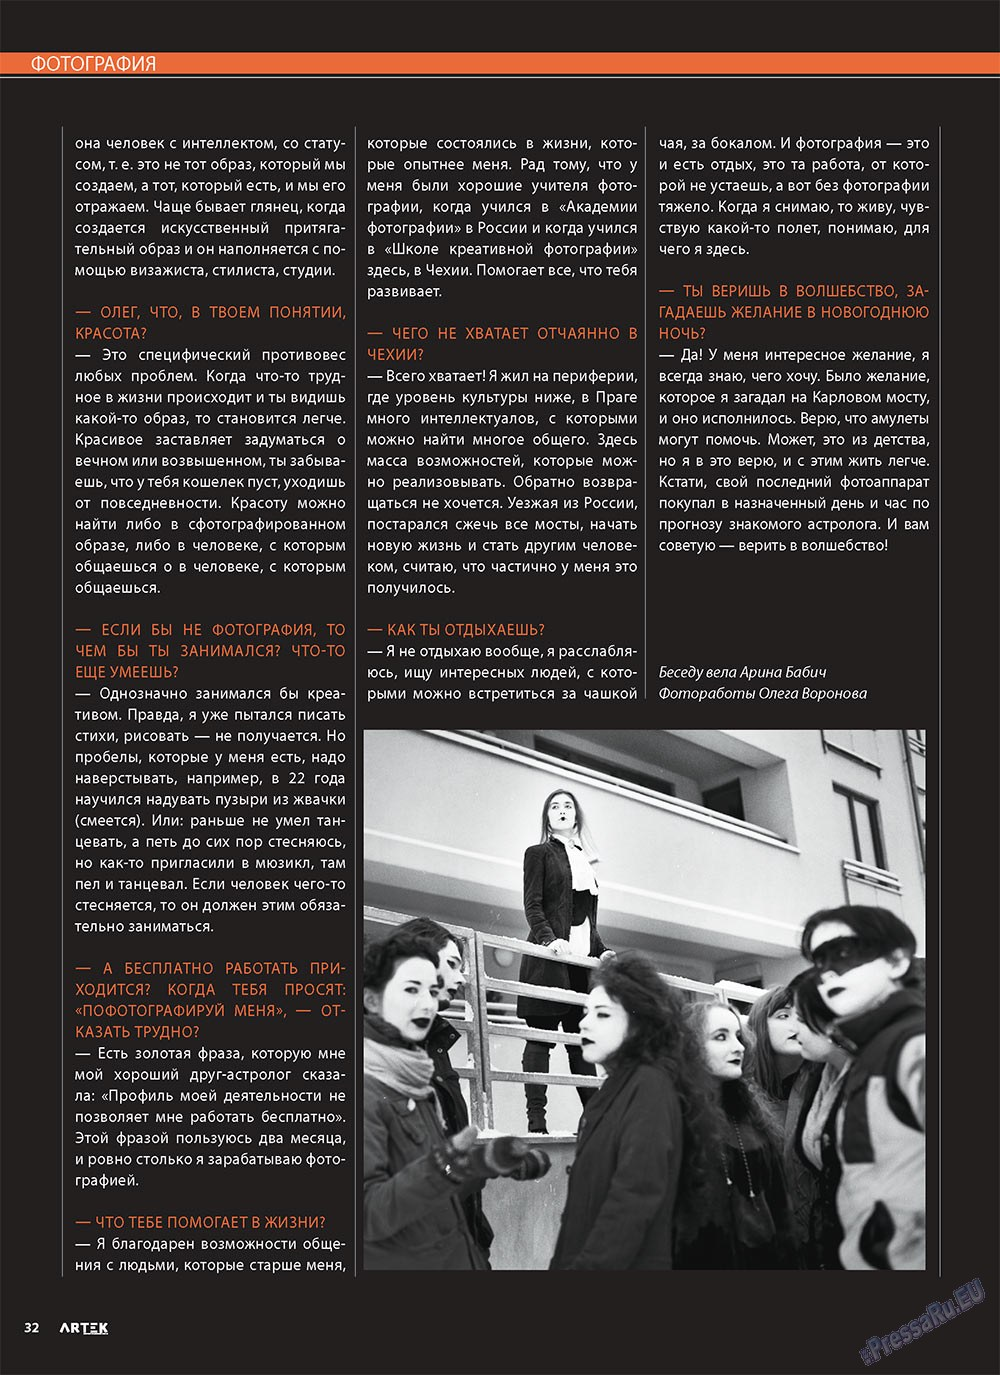 Артек (журнал). 2010 год, номер 6, стр. 34